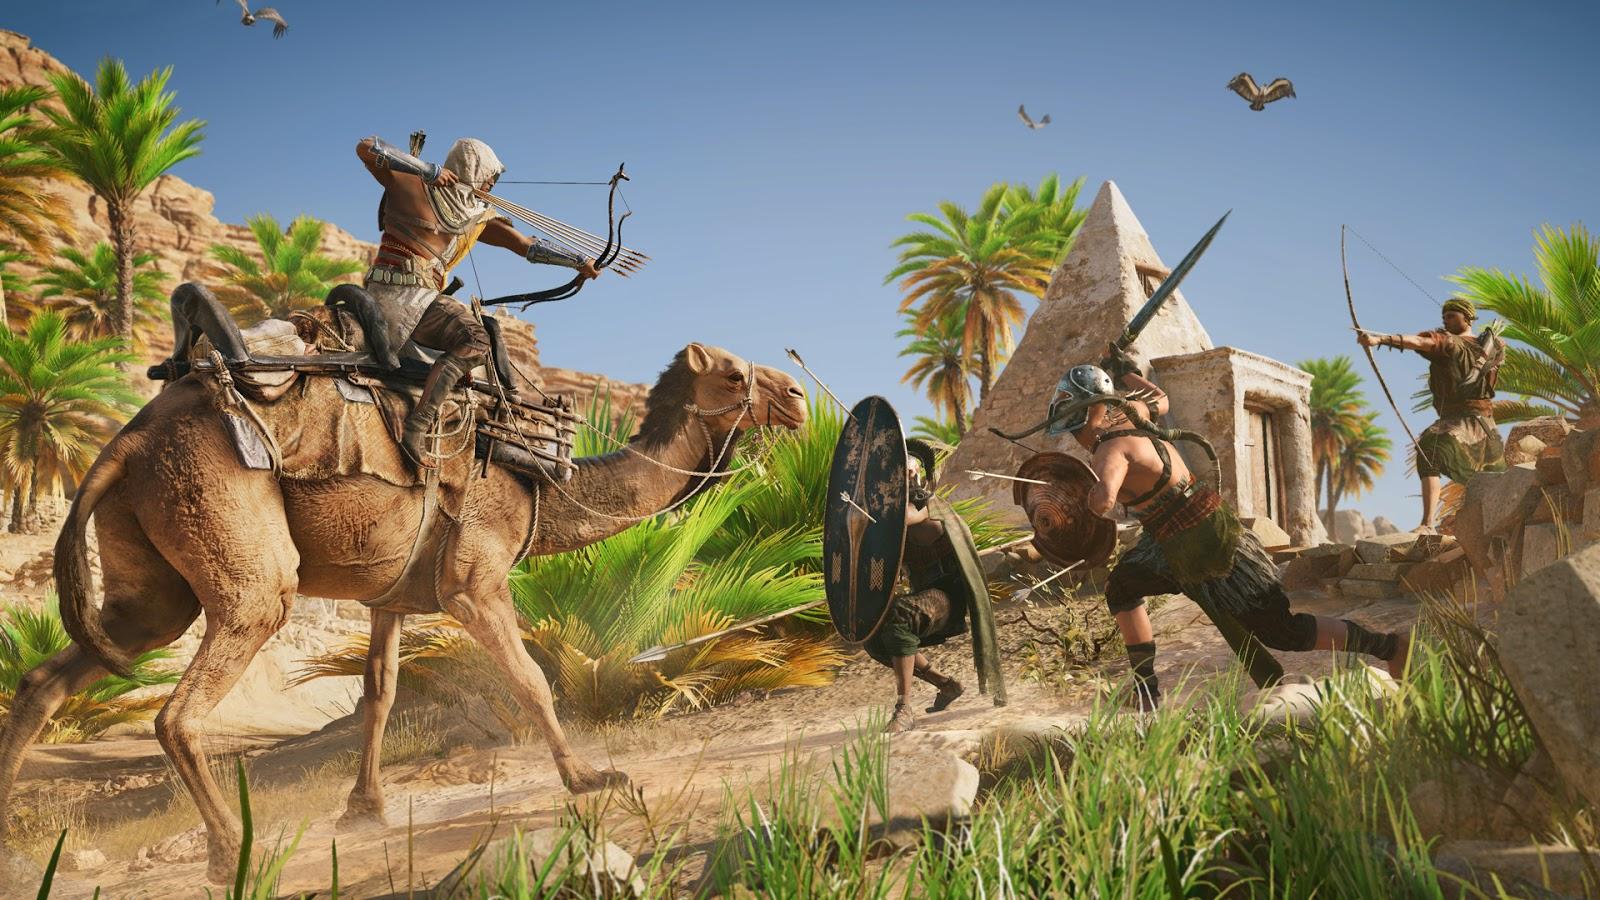 Assassin's Creed Origins The Curse Of The Pharaohs PC ESPAÑOL + Crackfix (CODEX) + REPACK 11 DVD5 (JPW) 7